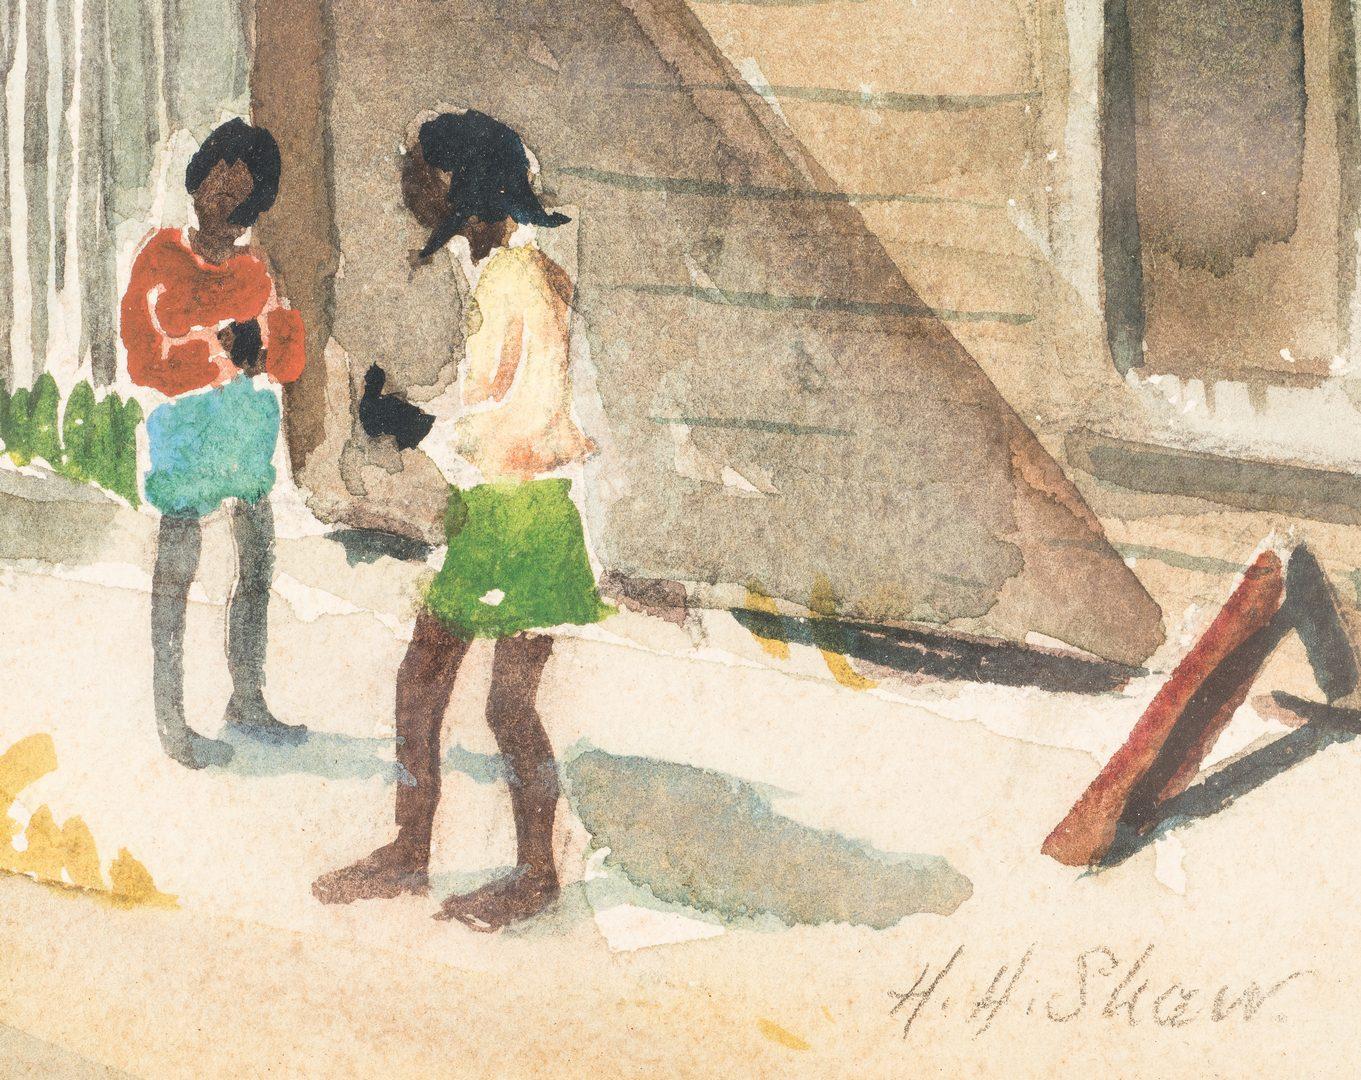 Lot 477: 2 Harry Shaw Watercolor Street Scenes, incl. Fish Market